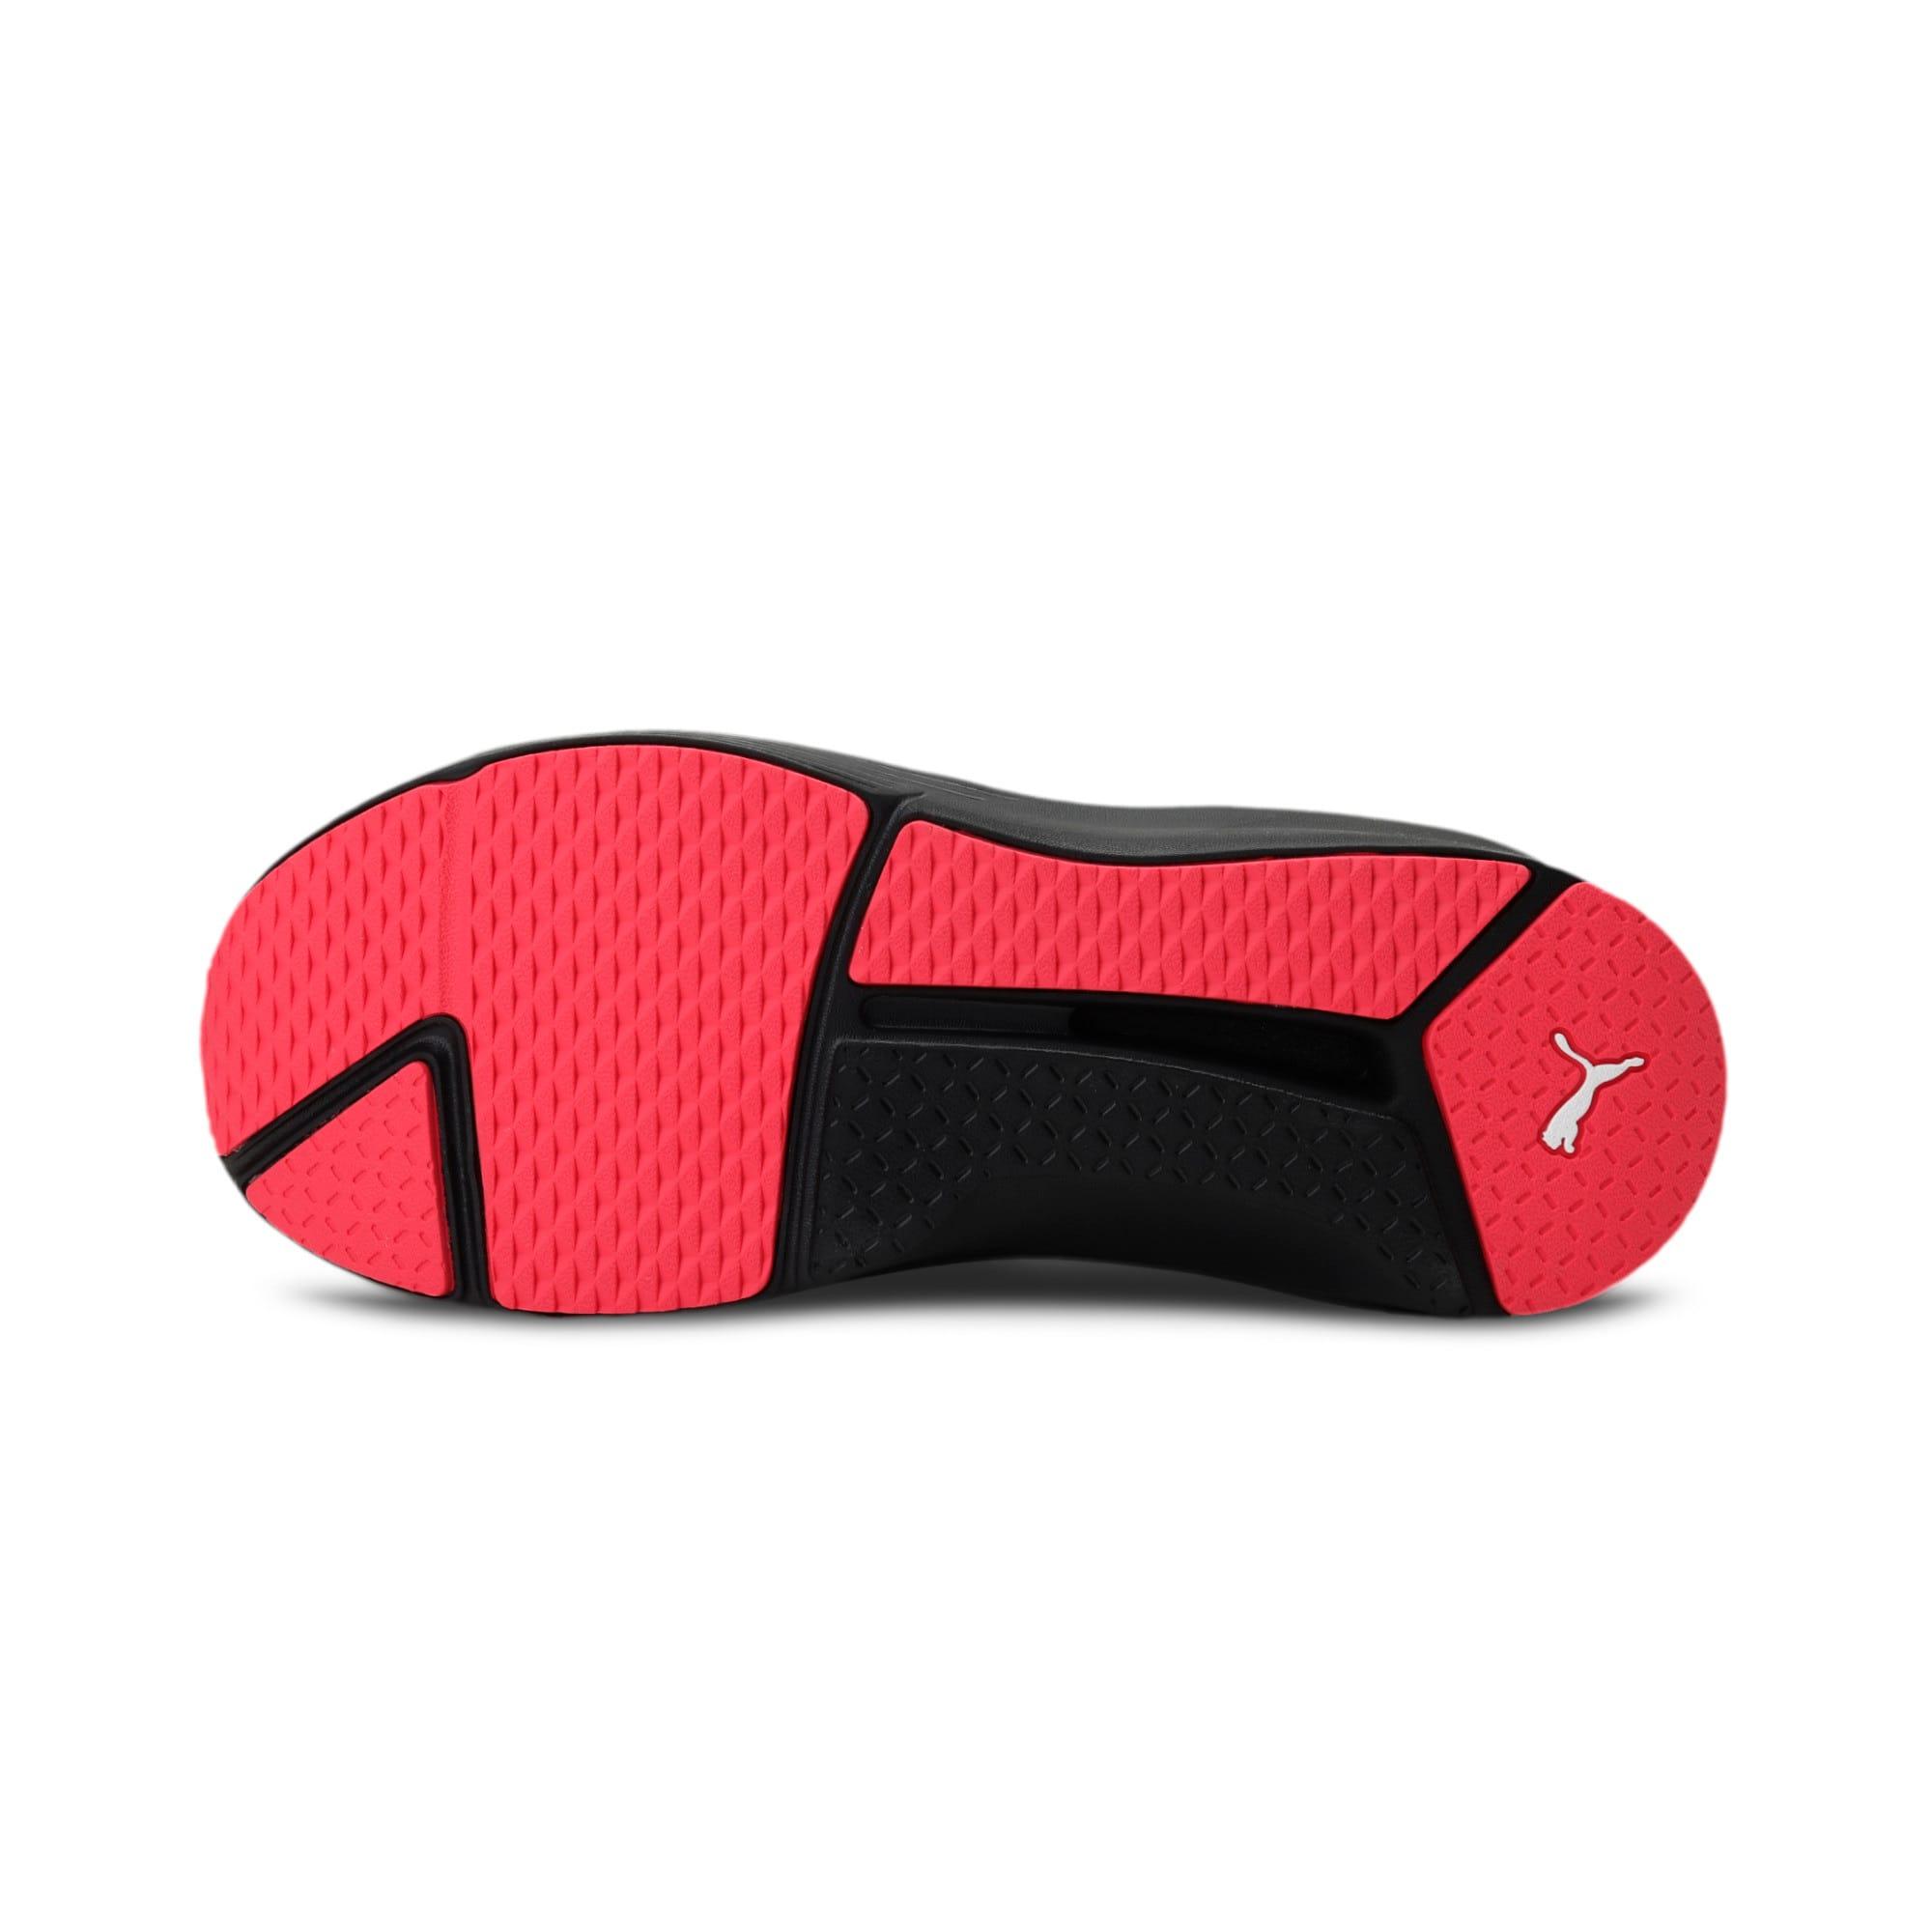 Thumbnail 4 of PUMA Fierce Core Training Shoes, Puma Black-Paradise Pink, medium-IND